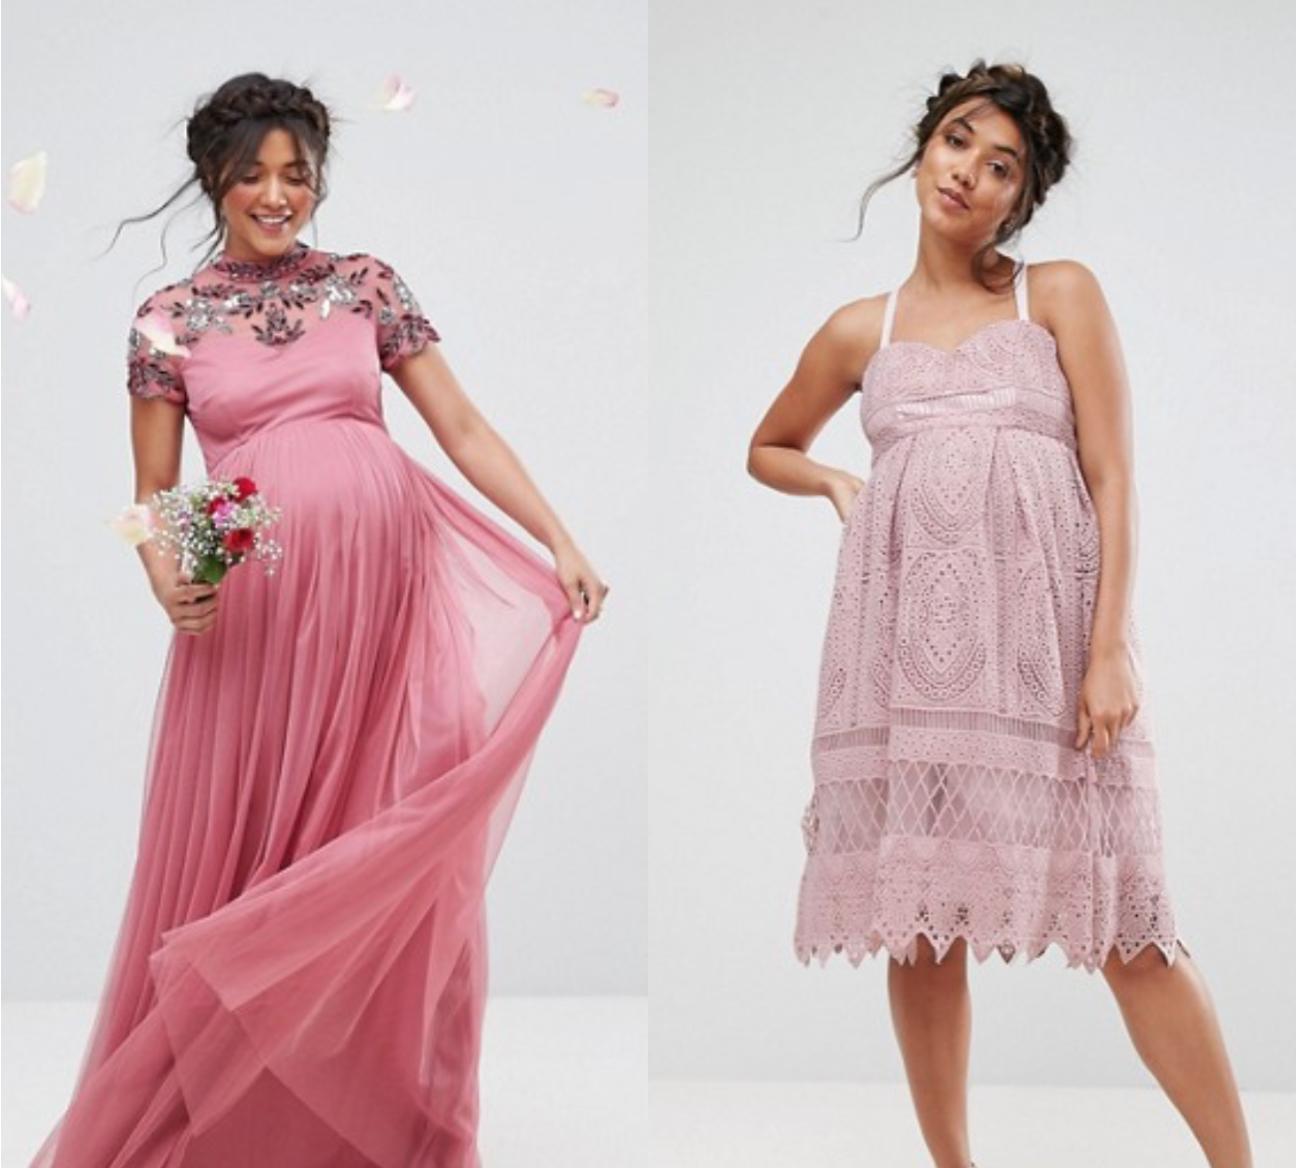 robes de maternit pour grandes occasions club mamans. Black Bedroom Furniture Sets. Home Design Ideas